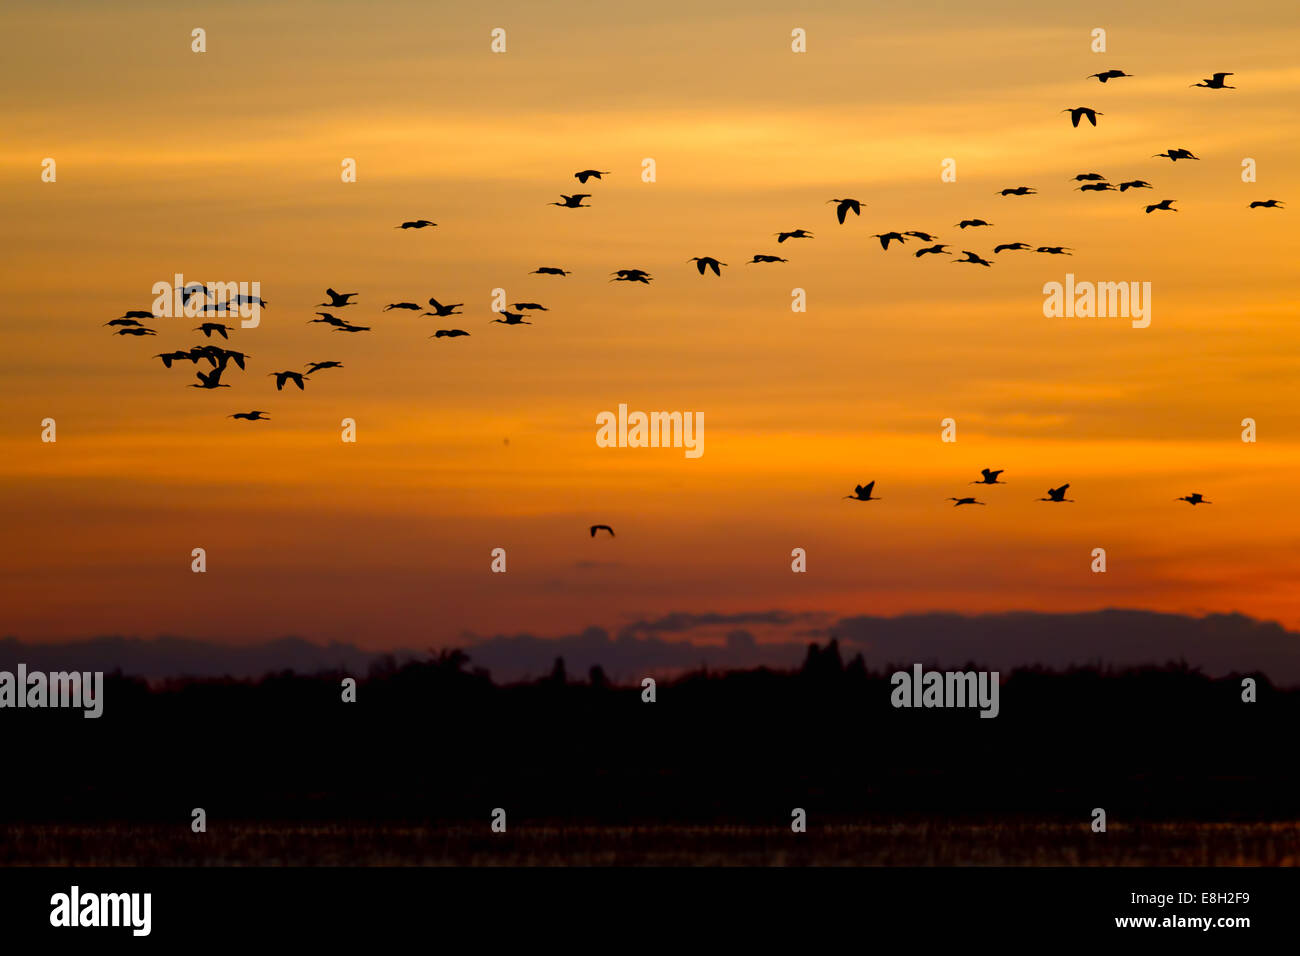 a flock of birds flies over bangweulu wetlands at sunset - Stock Image